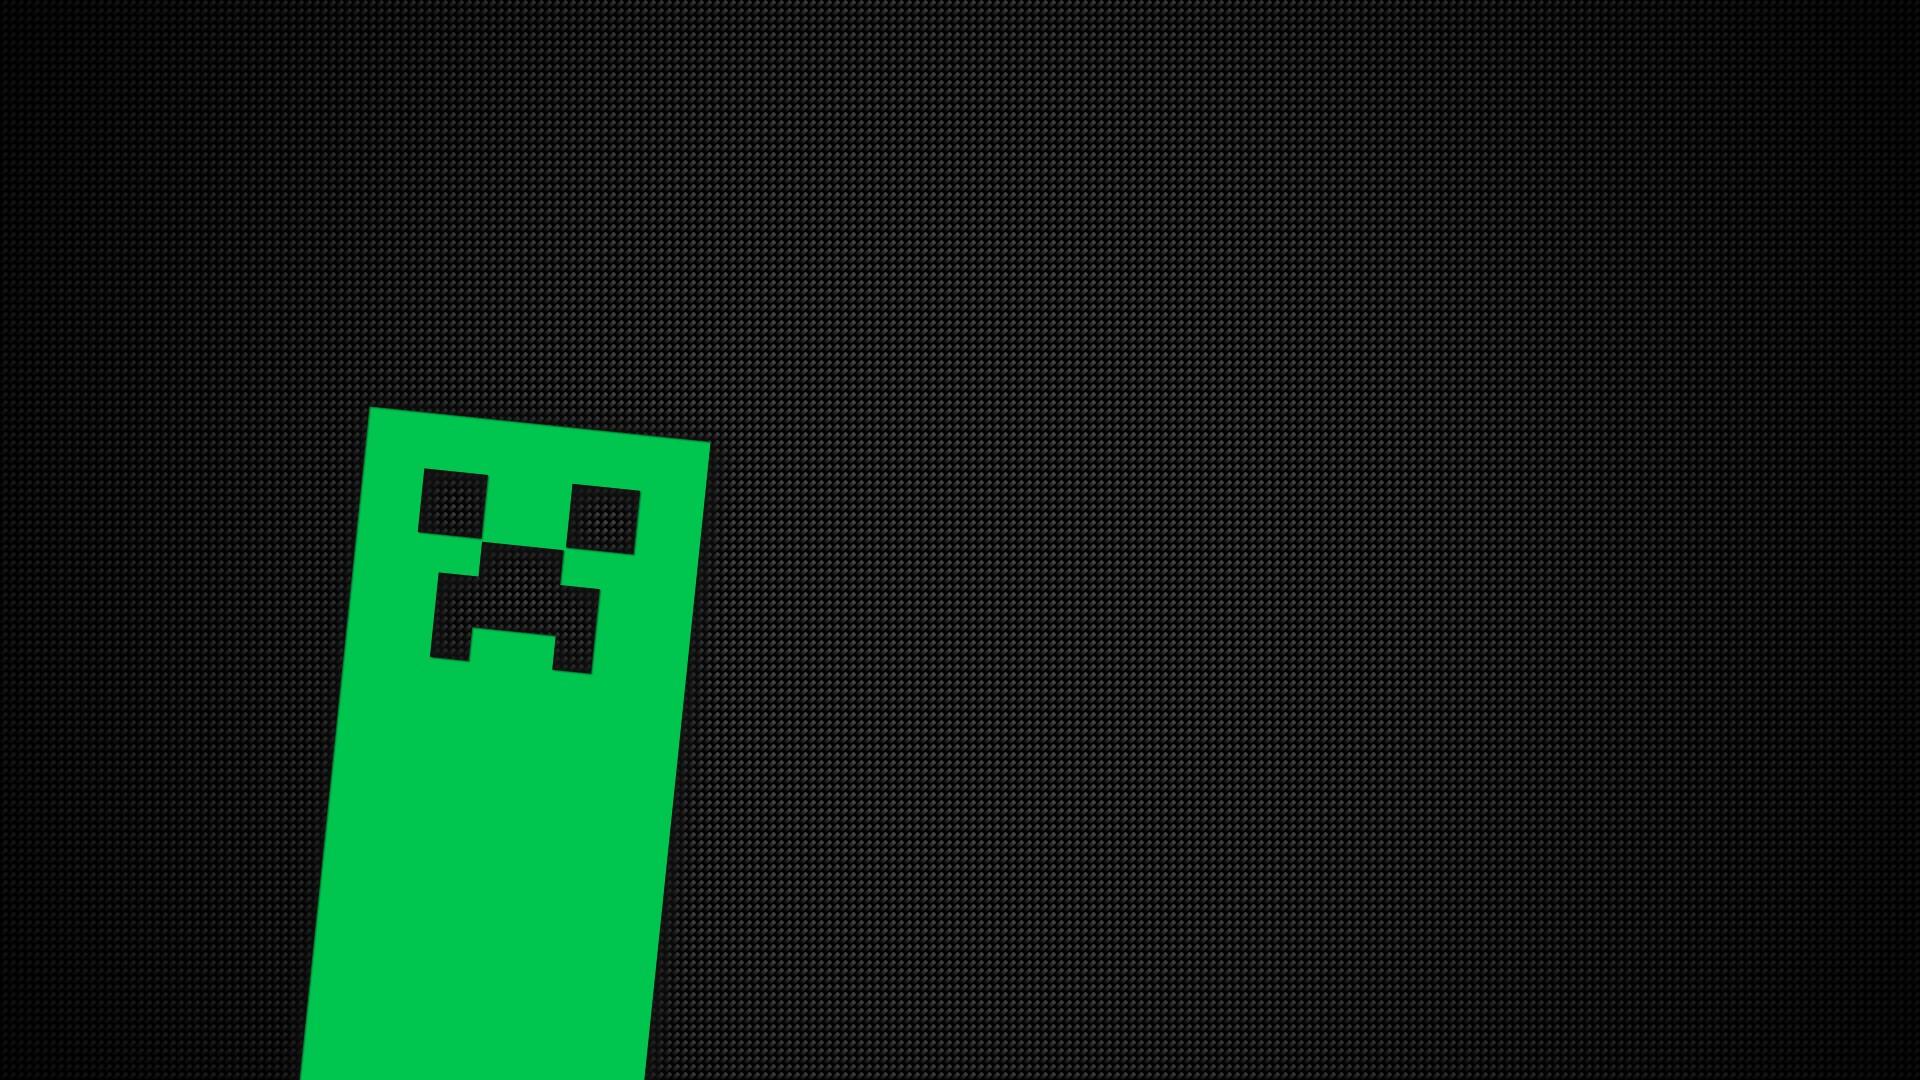 black video games text Minecraft green creeper pattern brand shape design line darkness number screenshot 1920x1080